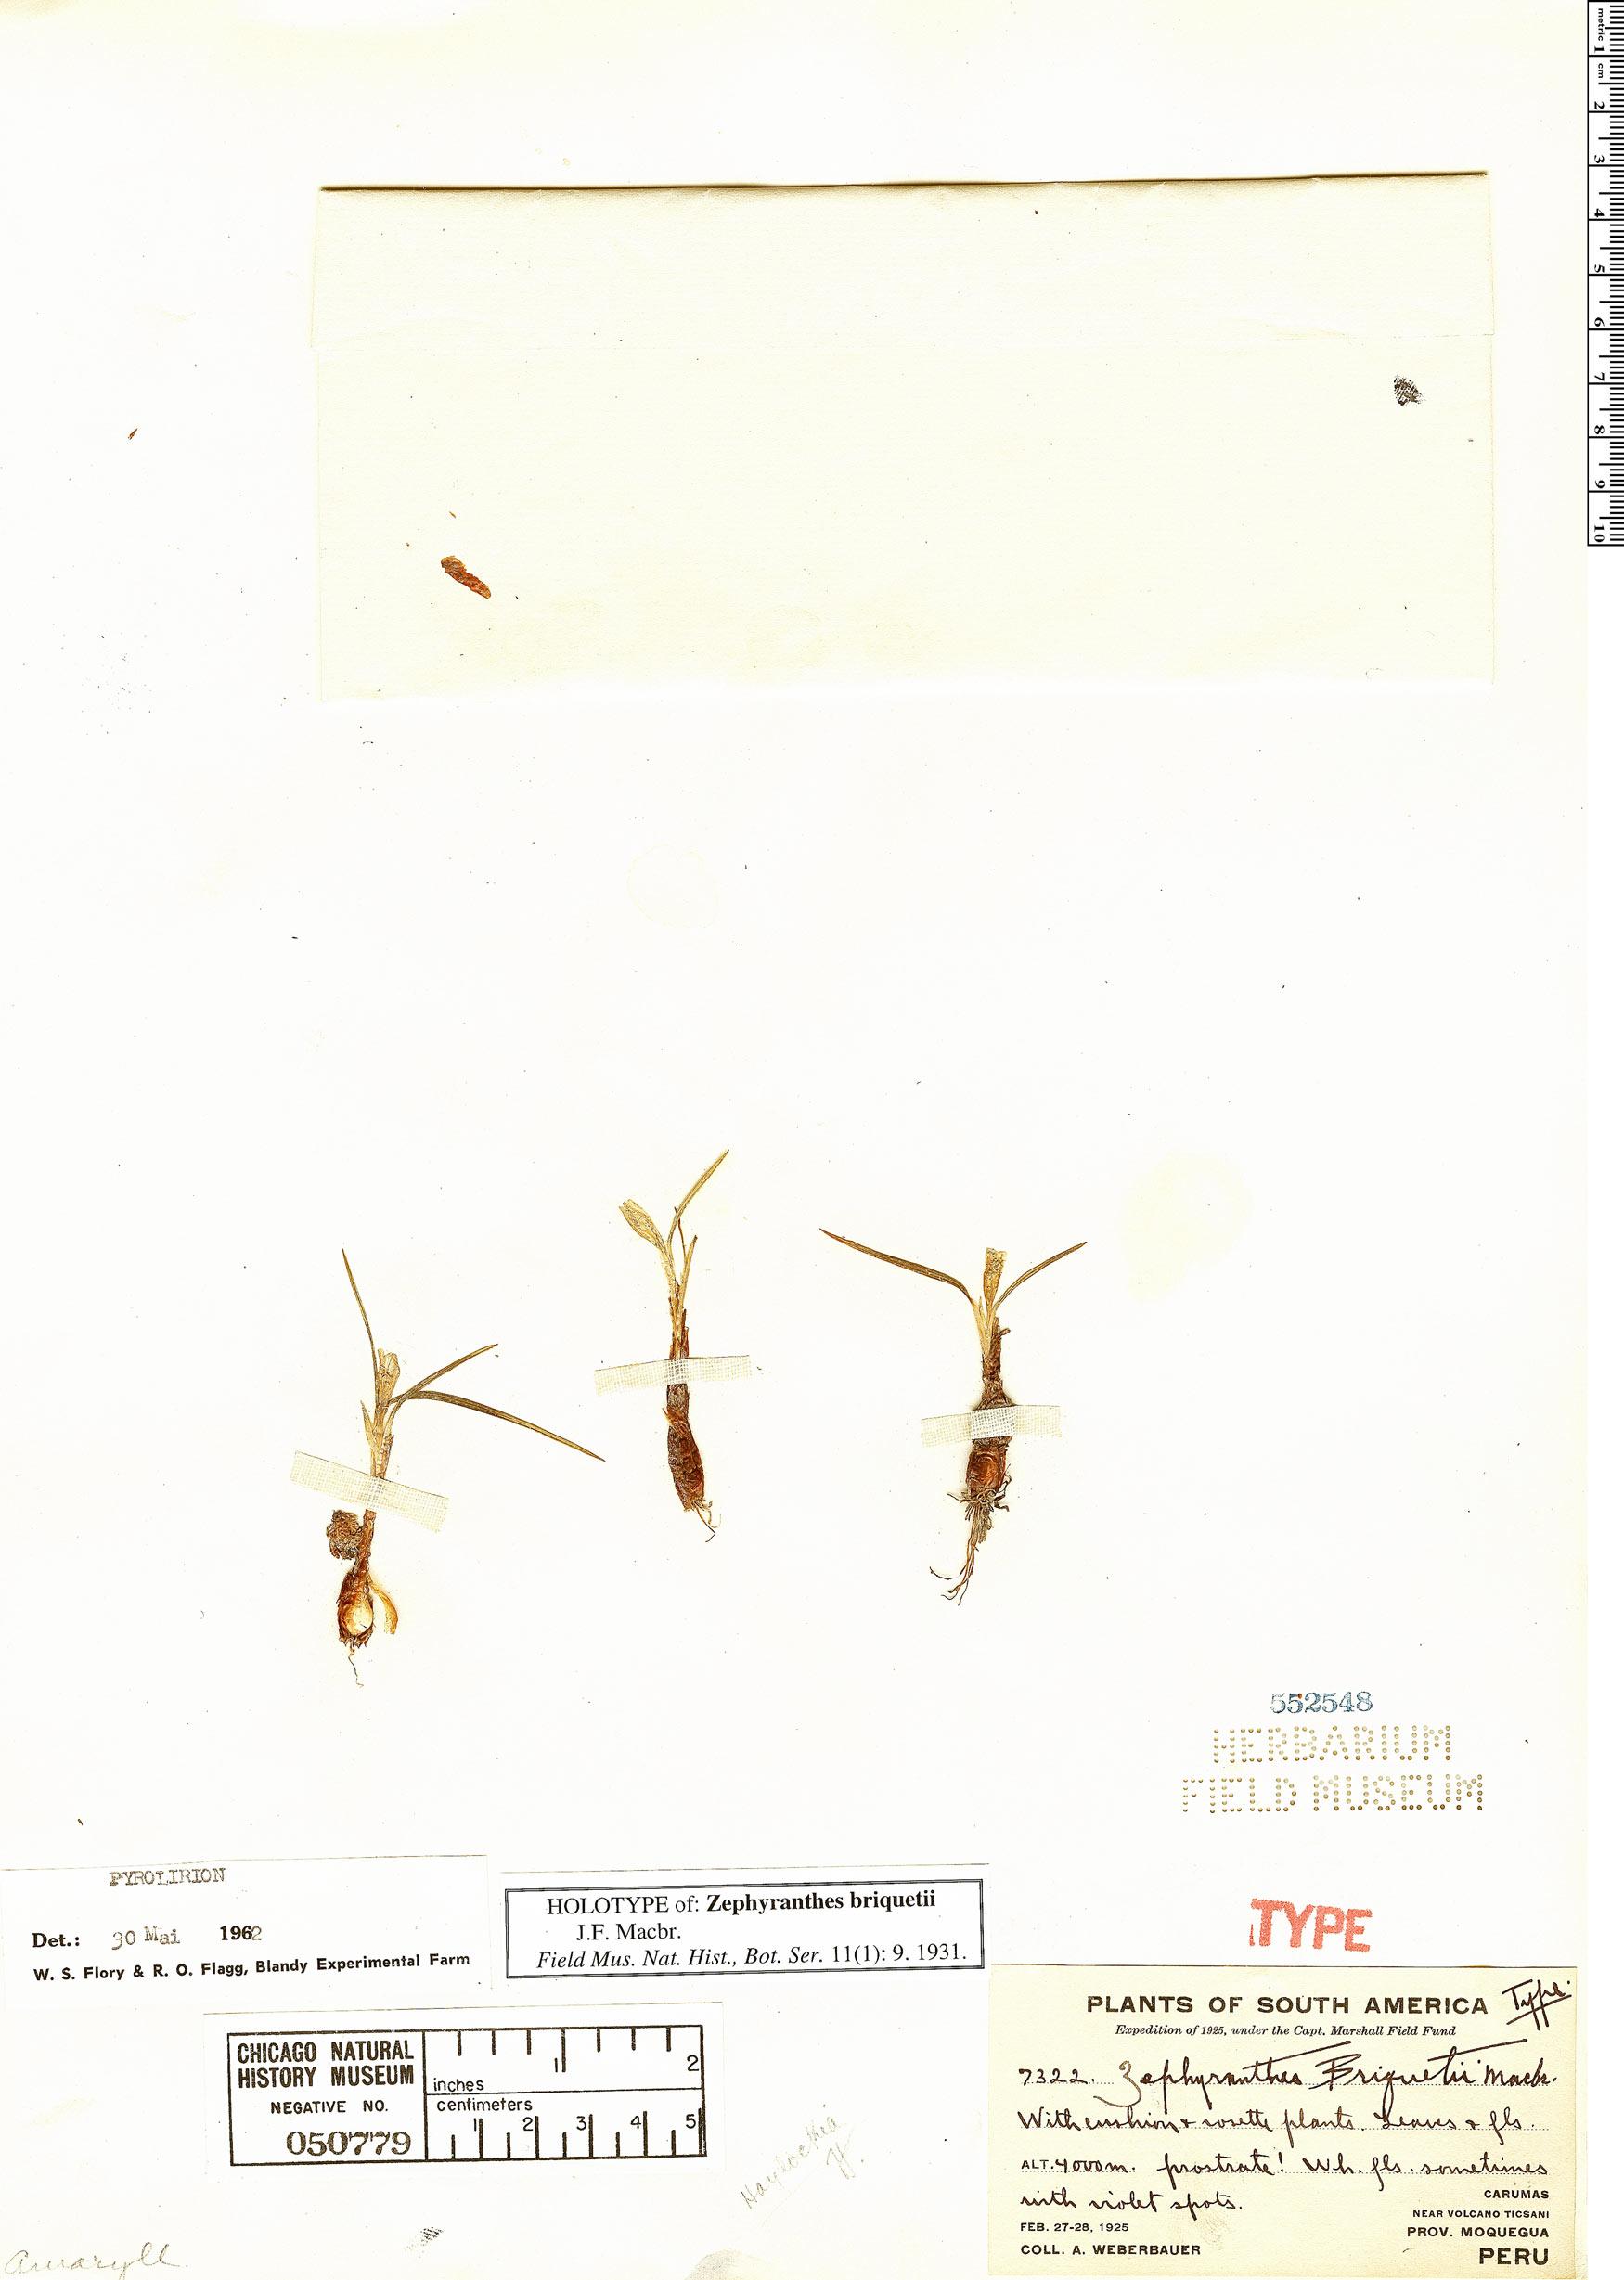 Specimen: Zephyranthes briquetii